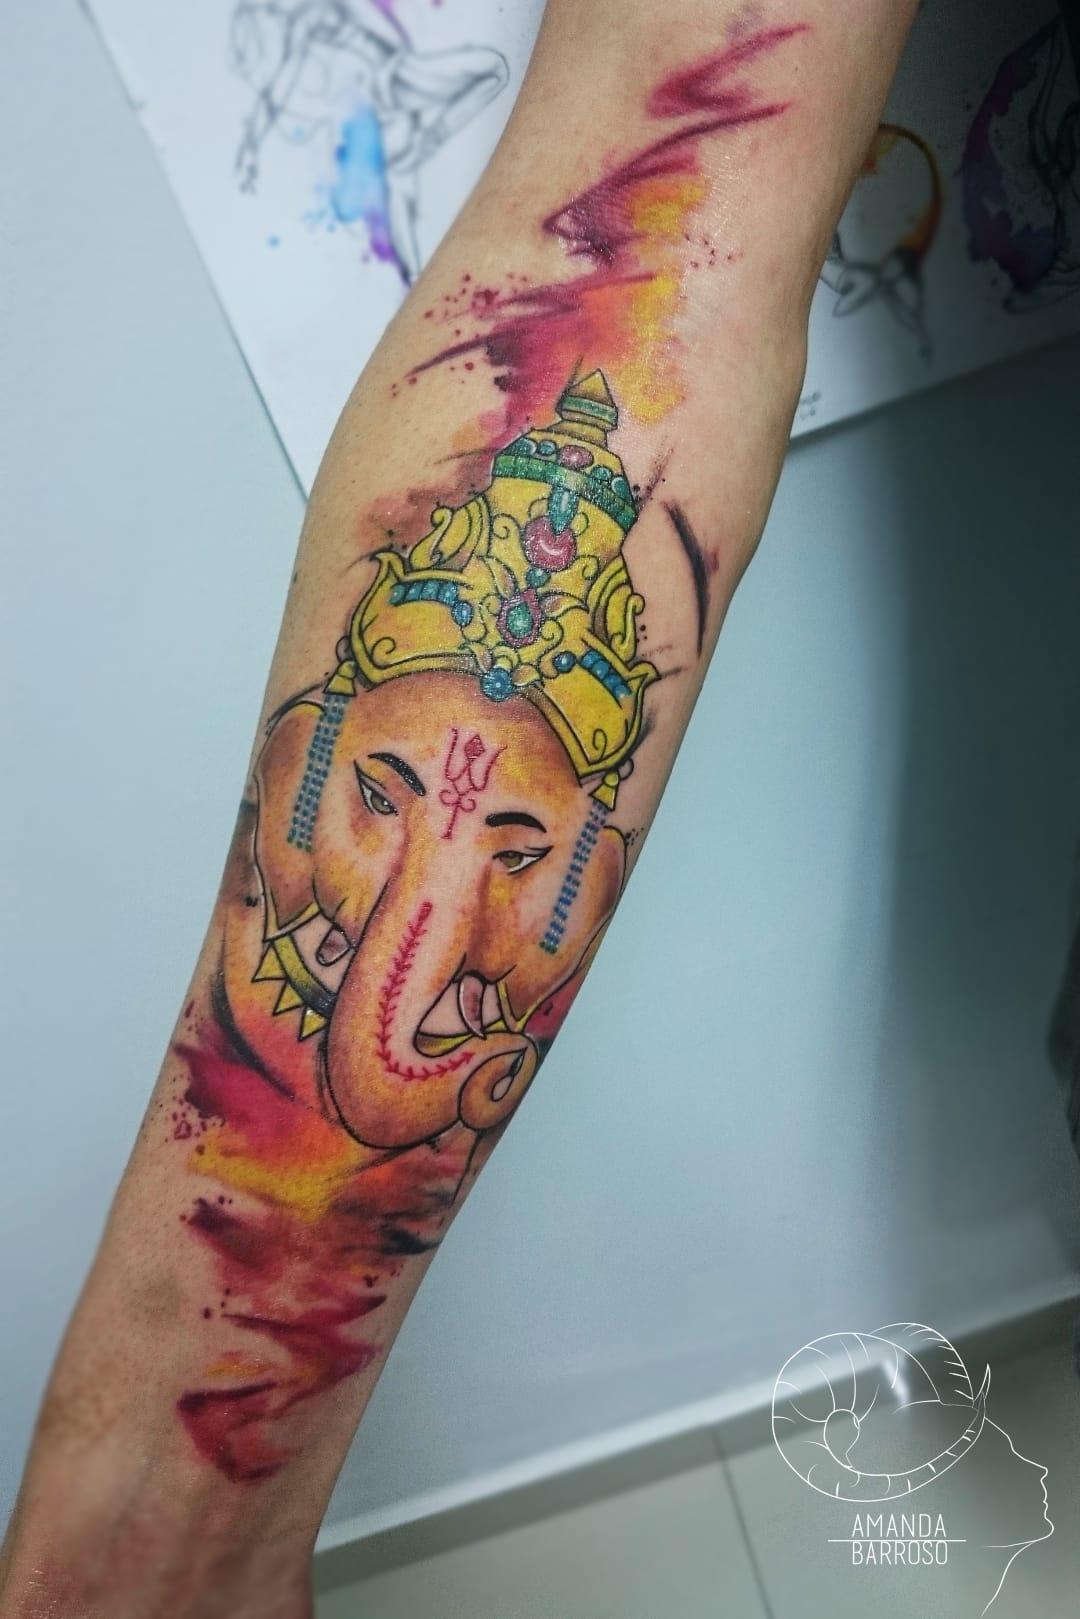 #AmandaBarroso #brasil #brazil #brazilianartist #TatuadorasDoBrasil #watercolor #aquarela #colorido #colorful #ganesha #deus #god #hindu #hinduism #elefante #elephant